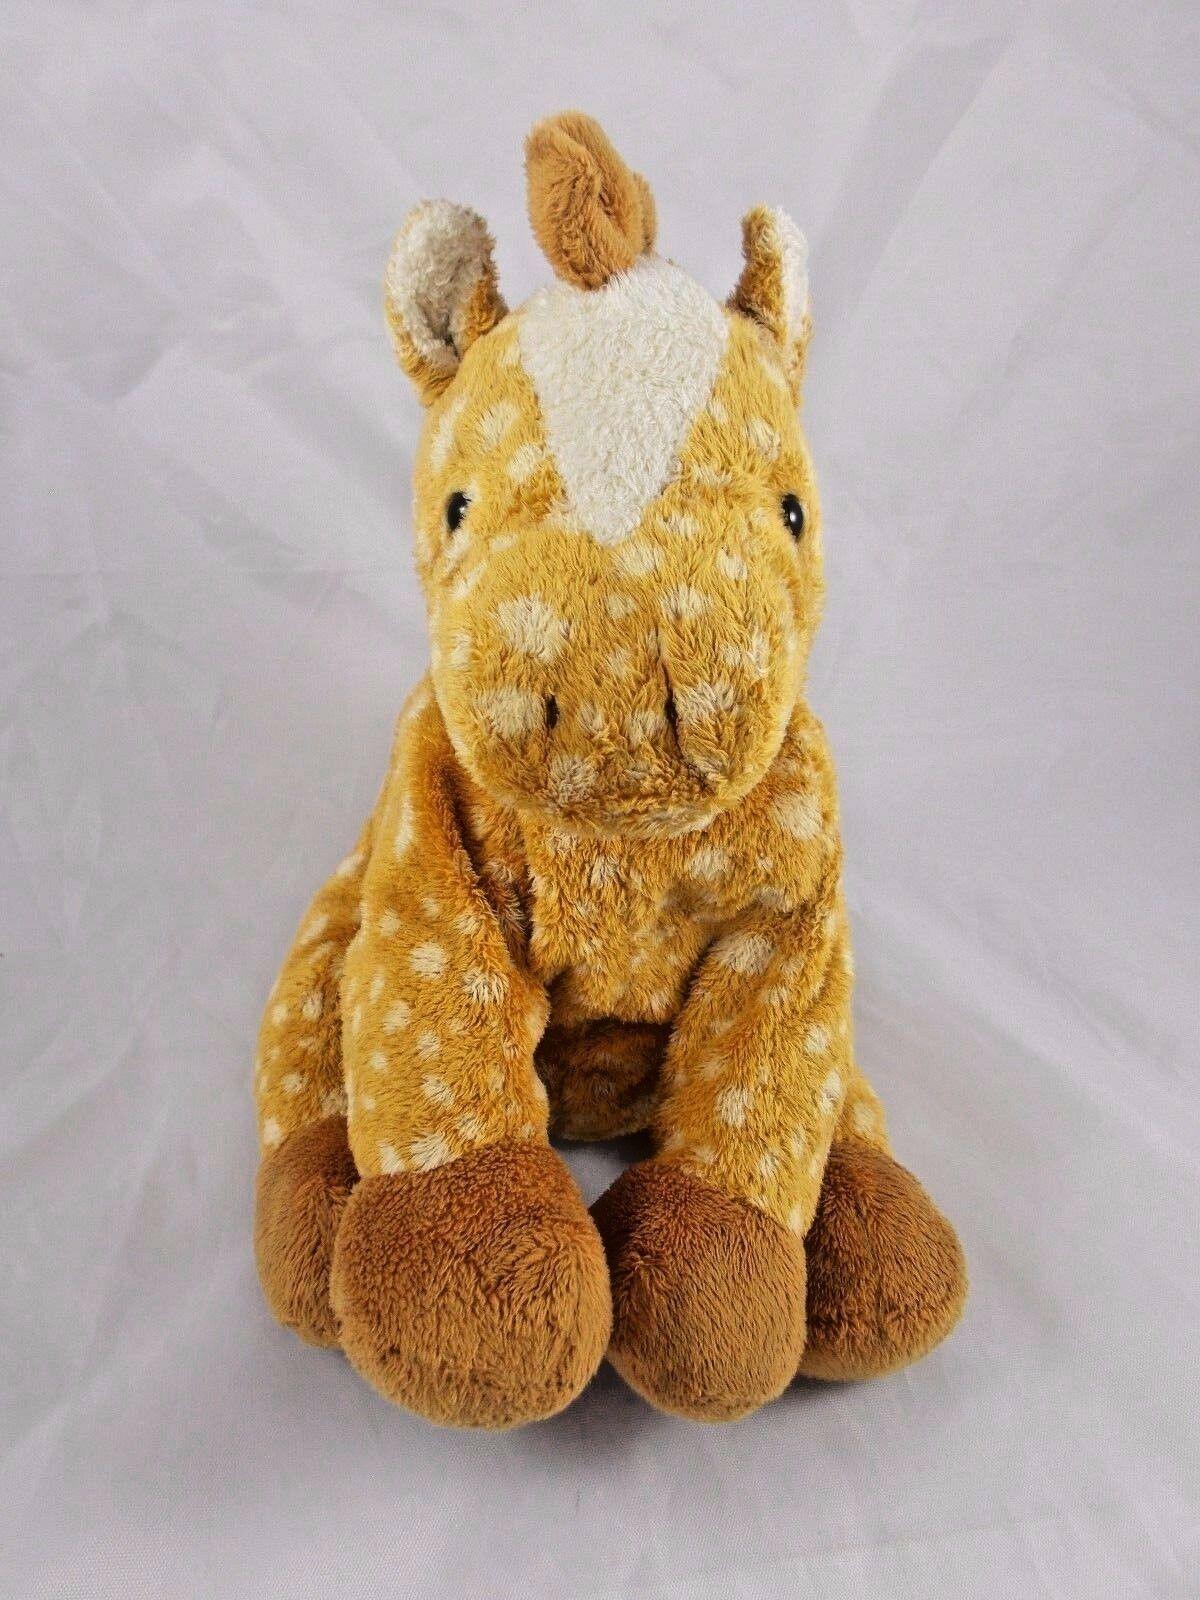 Ty Pluffies Plush Horse Lasso 2003 Stuffed Animal - $8.24